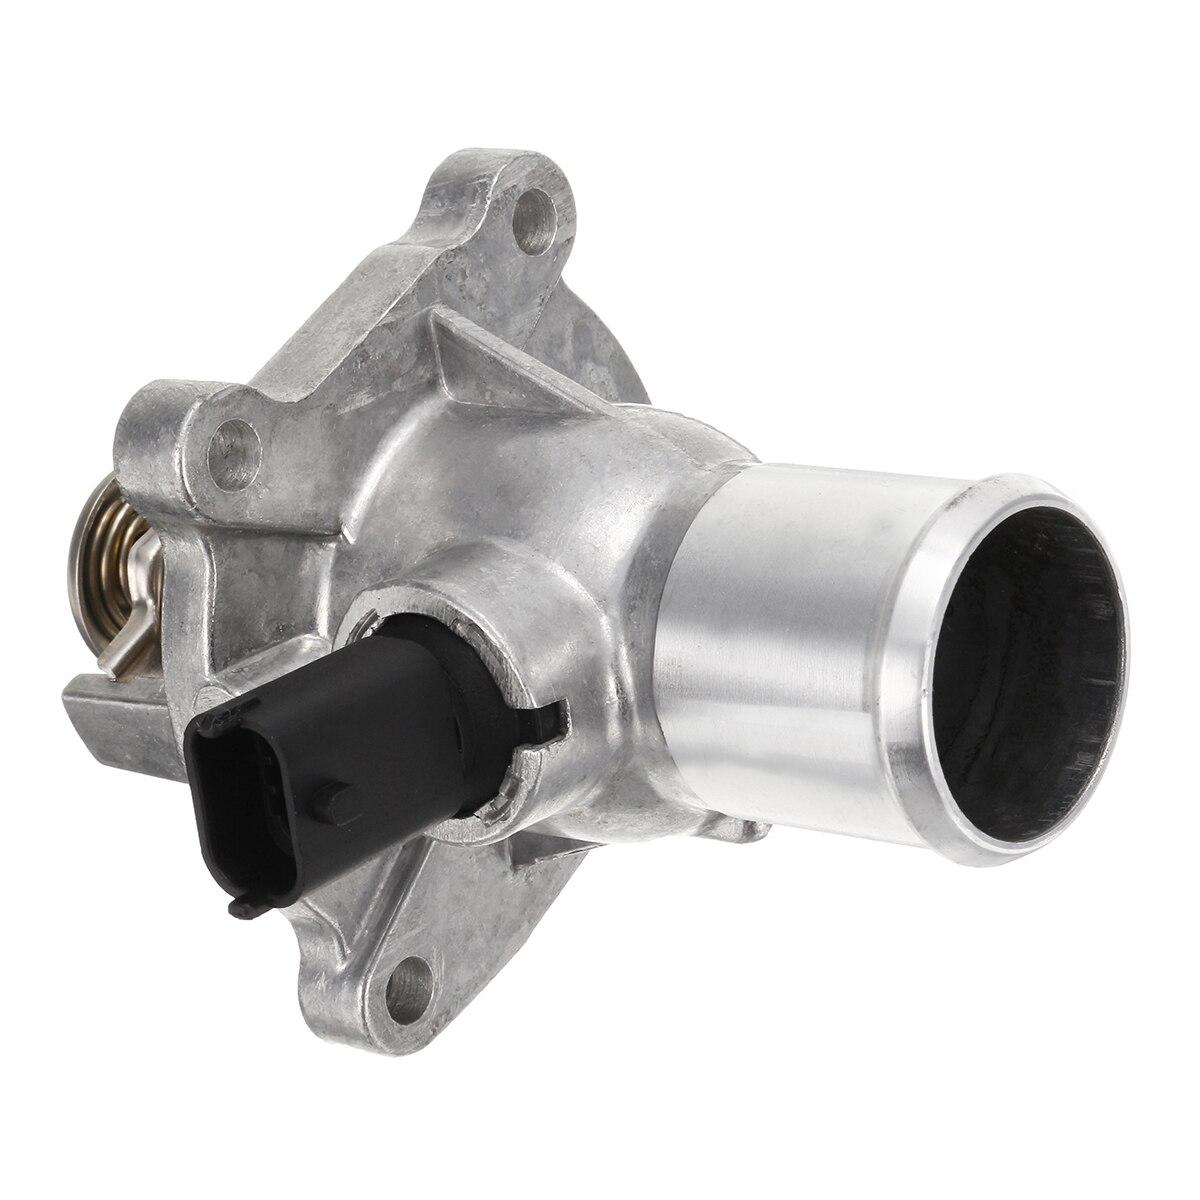 Auto termostato con la vivienda para Alfa para Fiat/Opel/Vauxhall para Pontiac Croma Astra H Insignia Meriva 24405922 55577072, 96984104